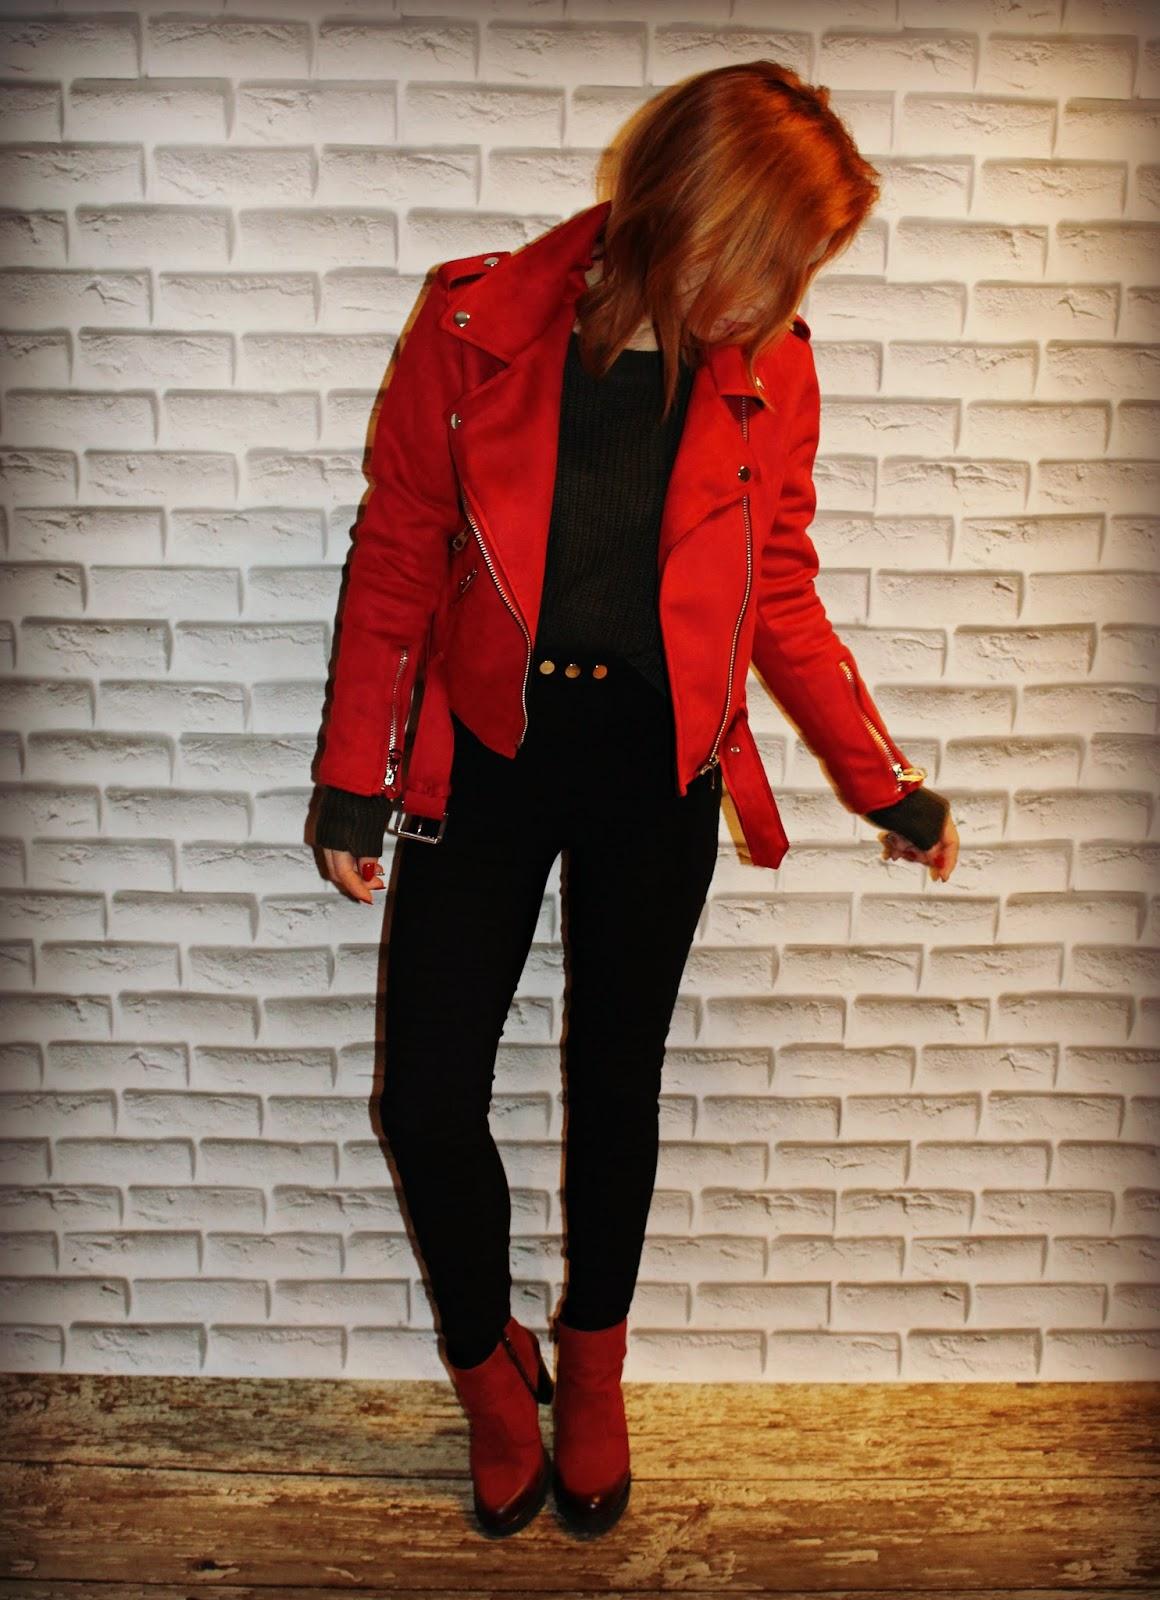 Fashion M.B Blog modowy - Monika Balsam - Sztum - Sztumska Wieś